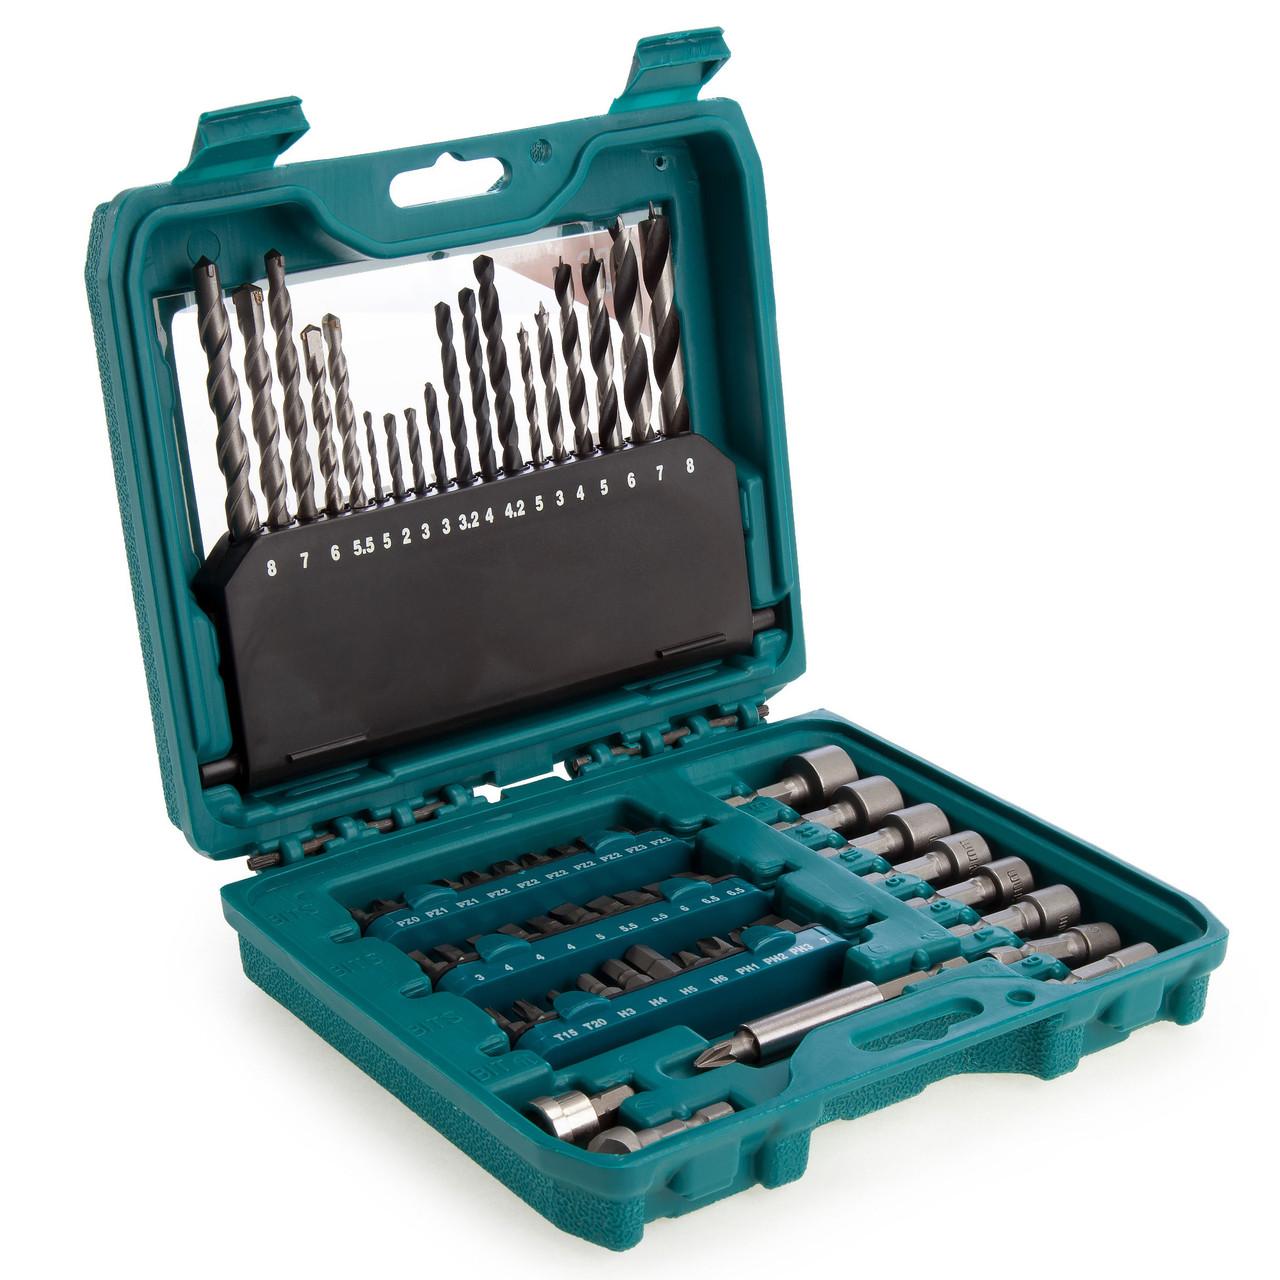 Makita P-90358 60 Piece Pro Drill and Bit Accessory Set